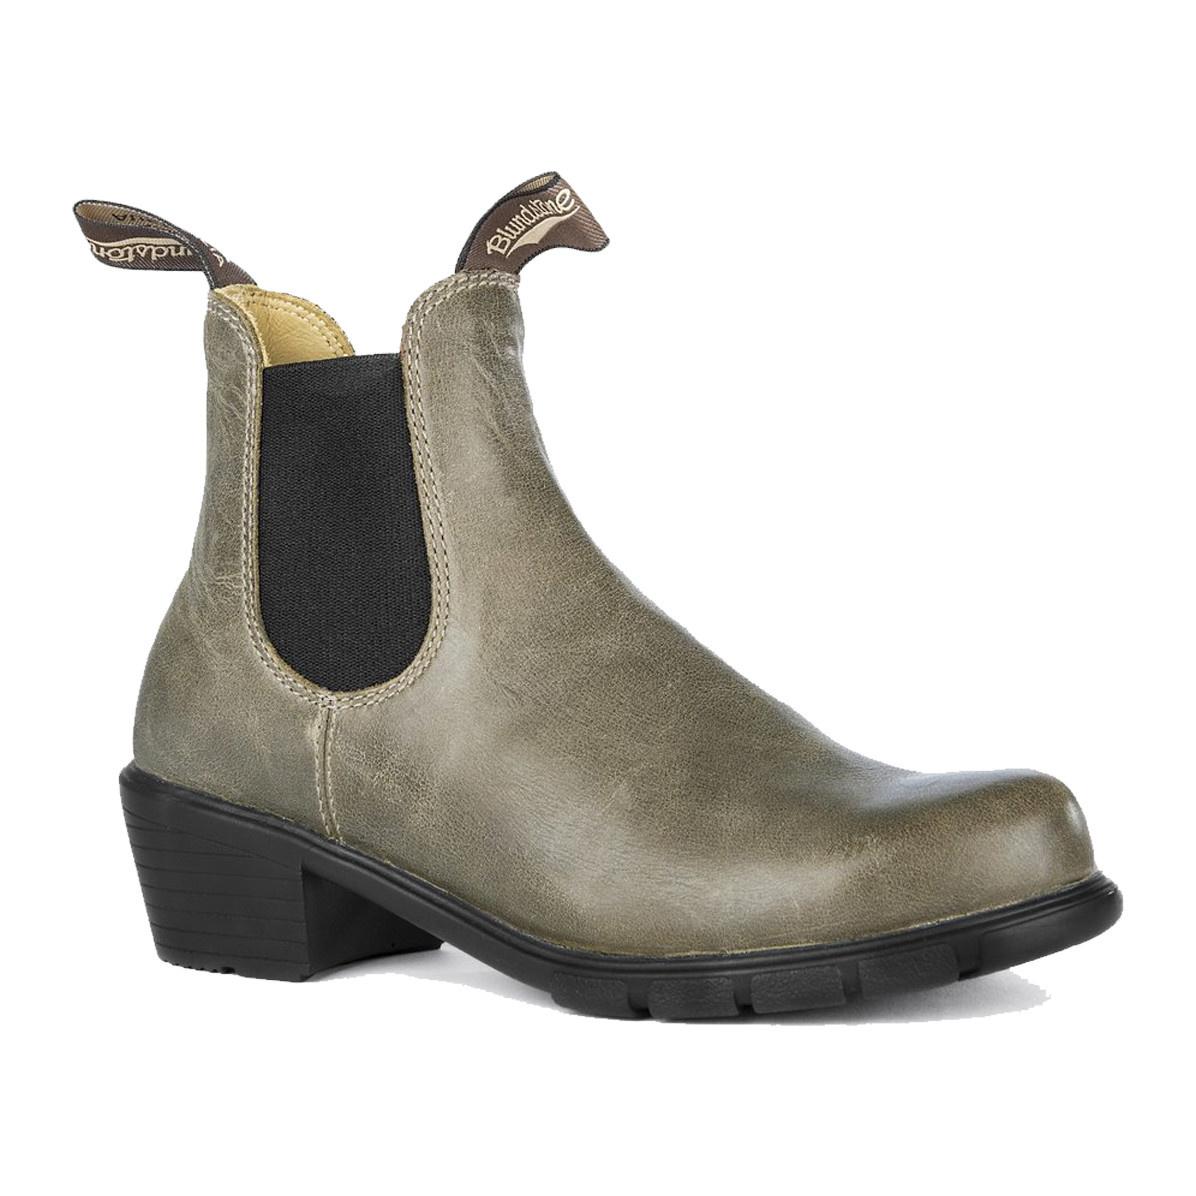 Blundstone Blundstone 1672 Women's Heel Antique Taupe